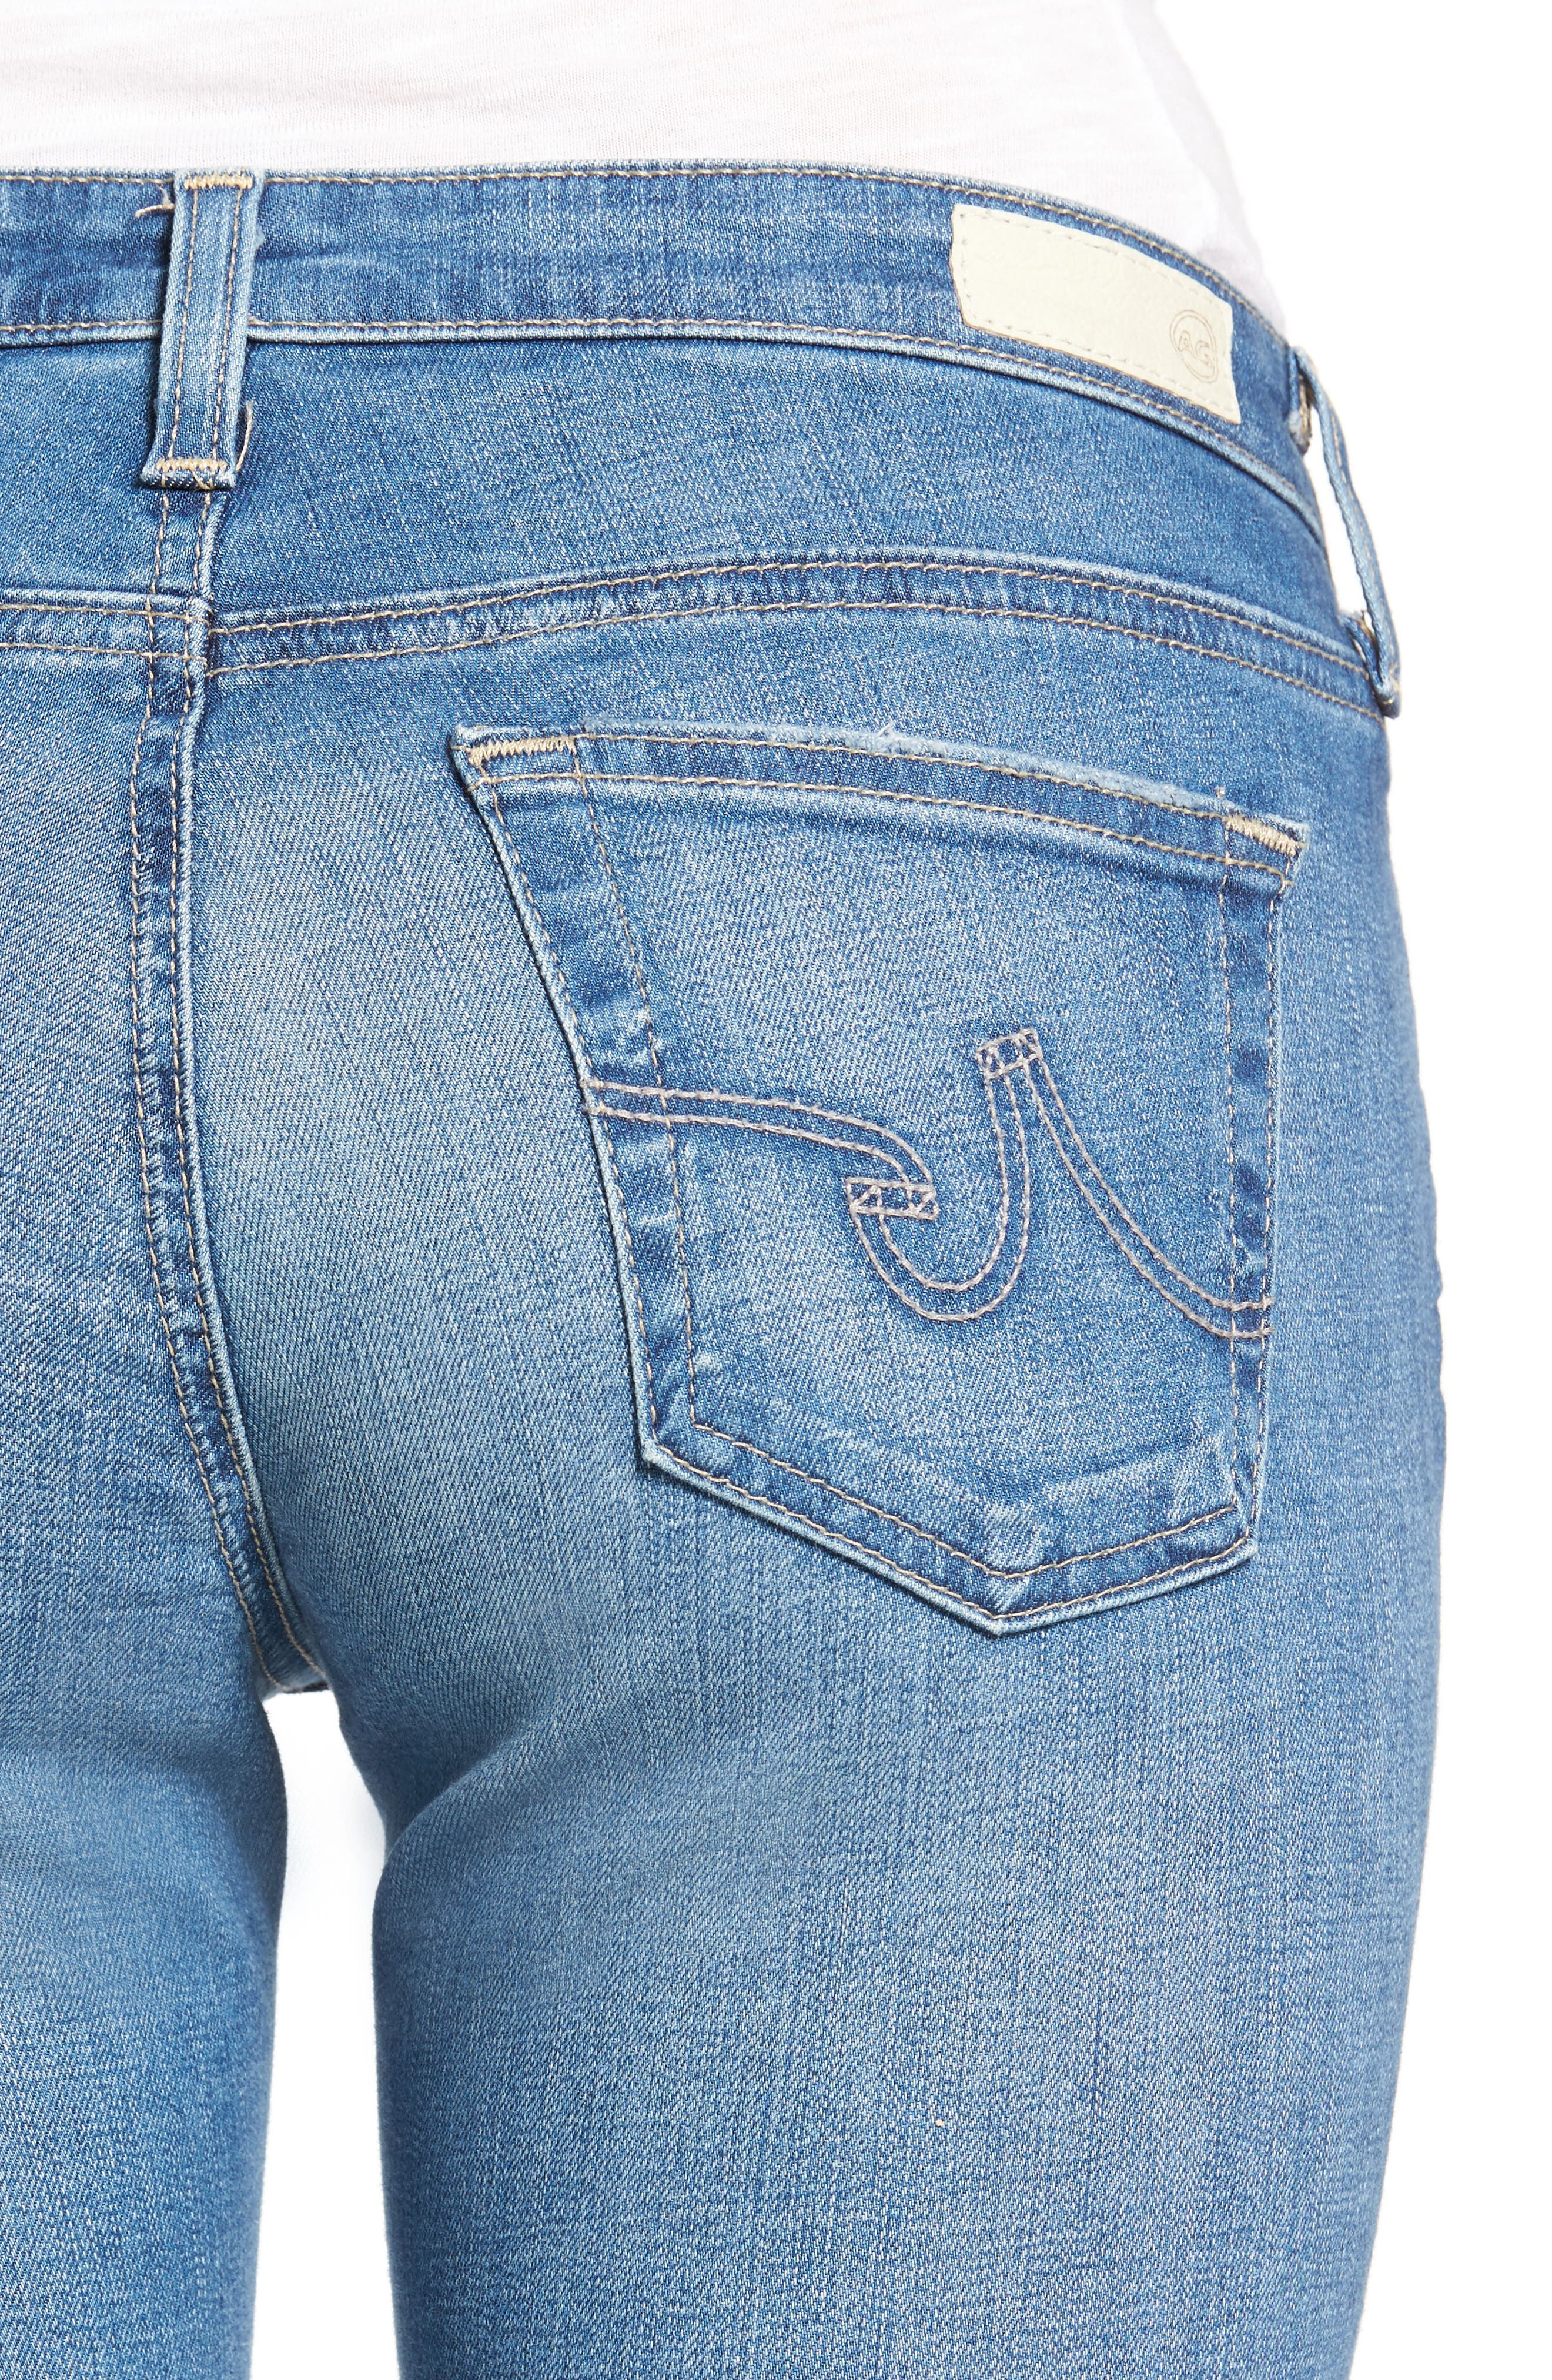 'The Legging' Super Skinny Jeans,                             Alternate thumbnail 46, color,